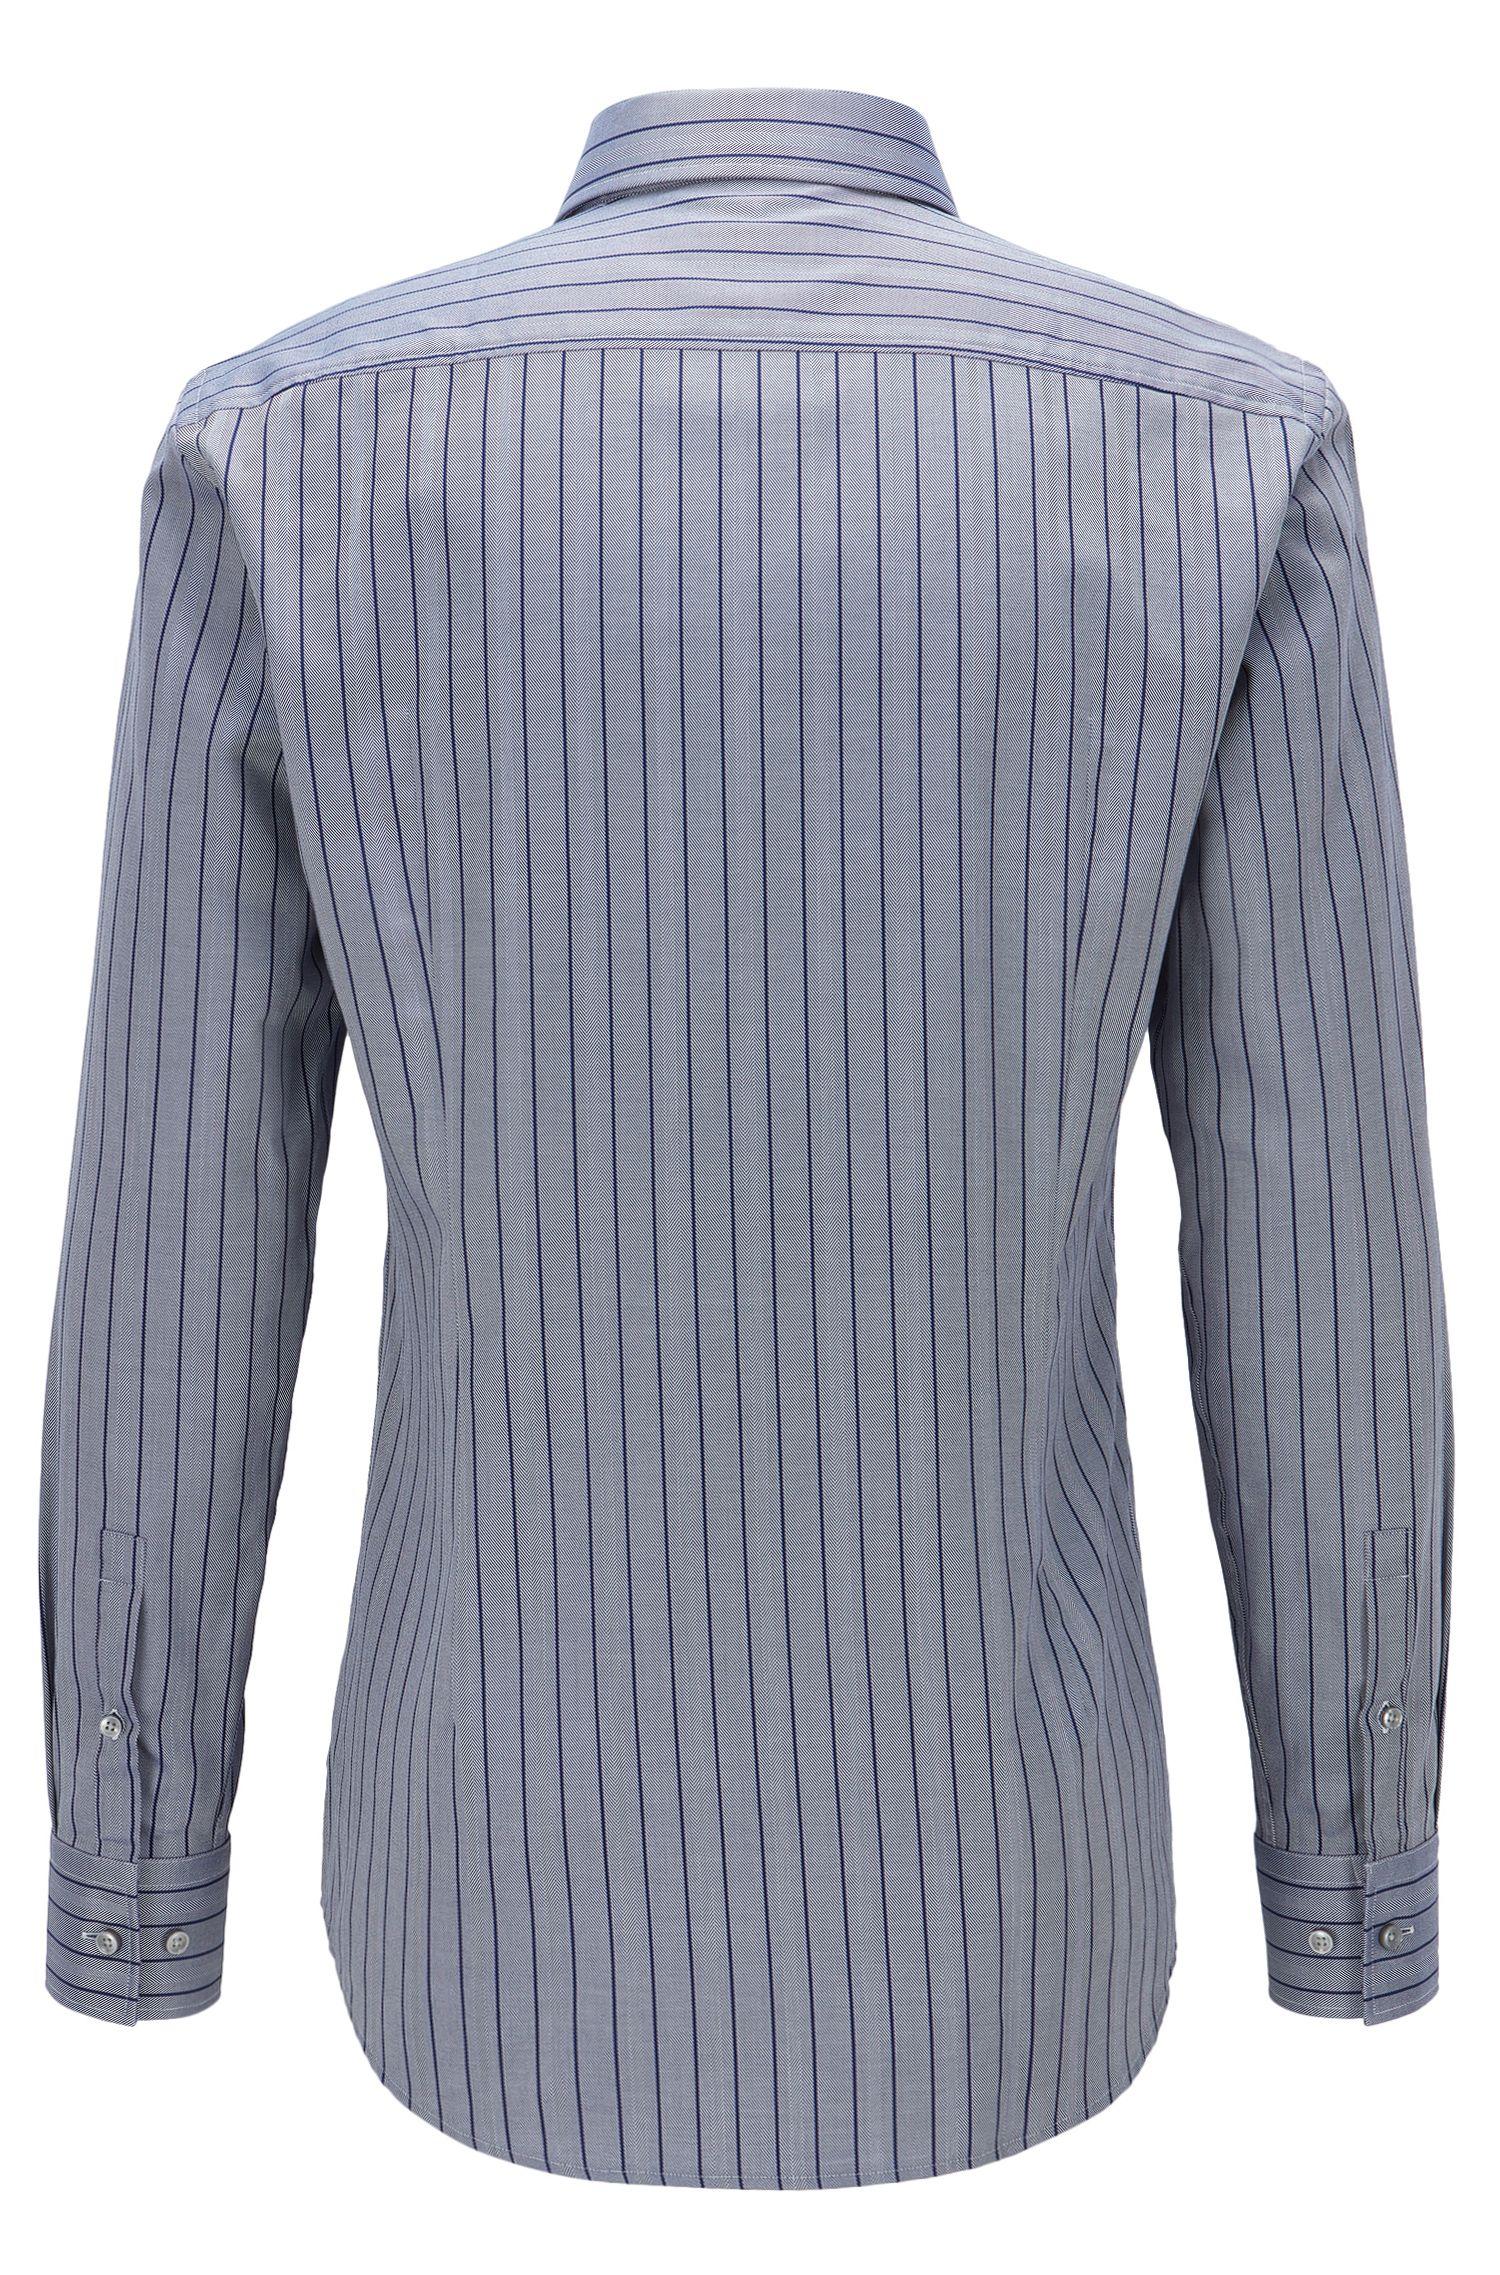 Striped Herringbone Cotton Dress Shirt, Slim Fit | Jason, Dark Blue